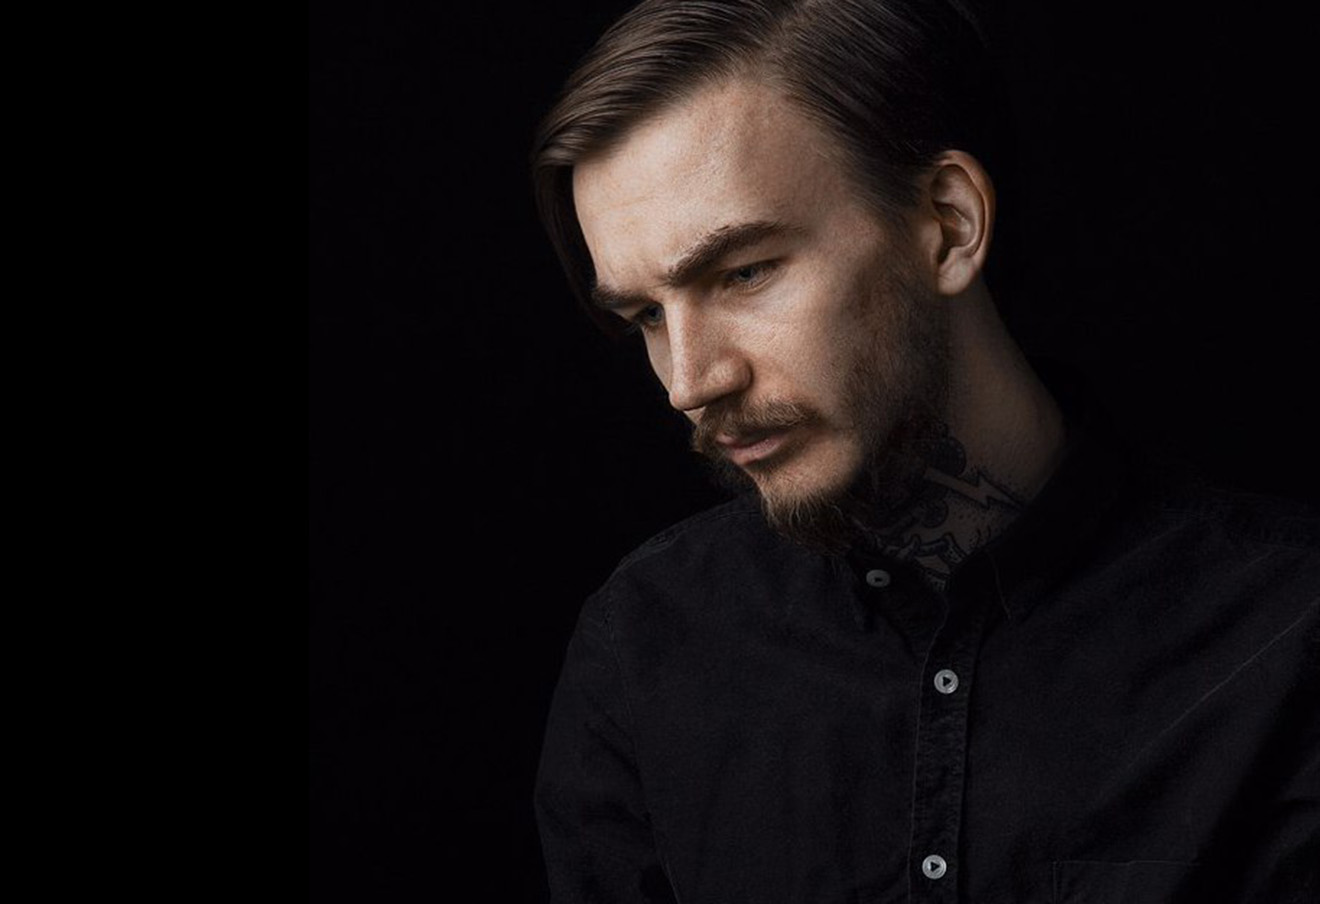 Никита Каф. Фото: личная страница ВКонтакте